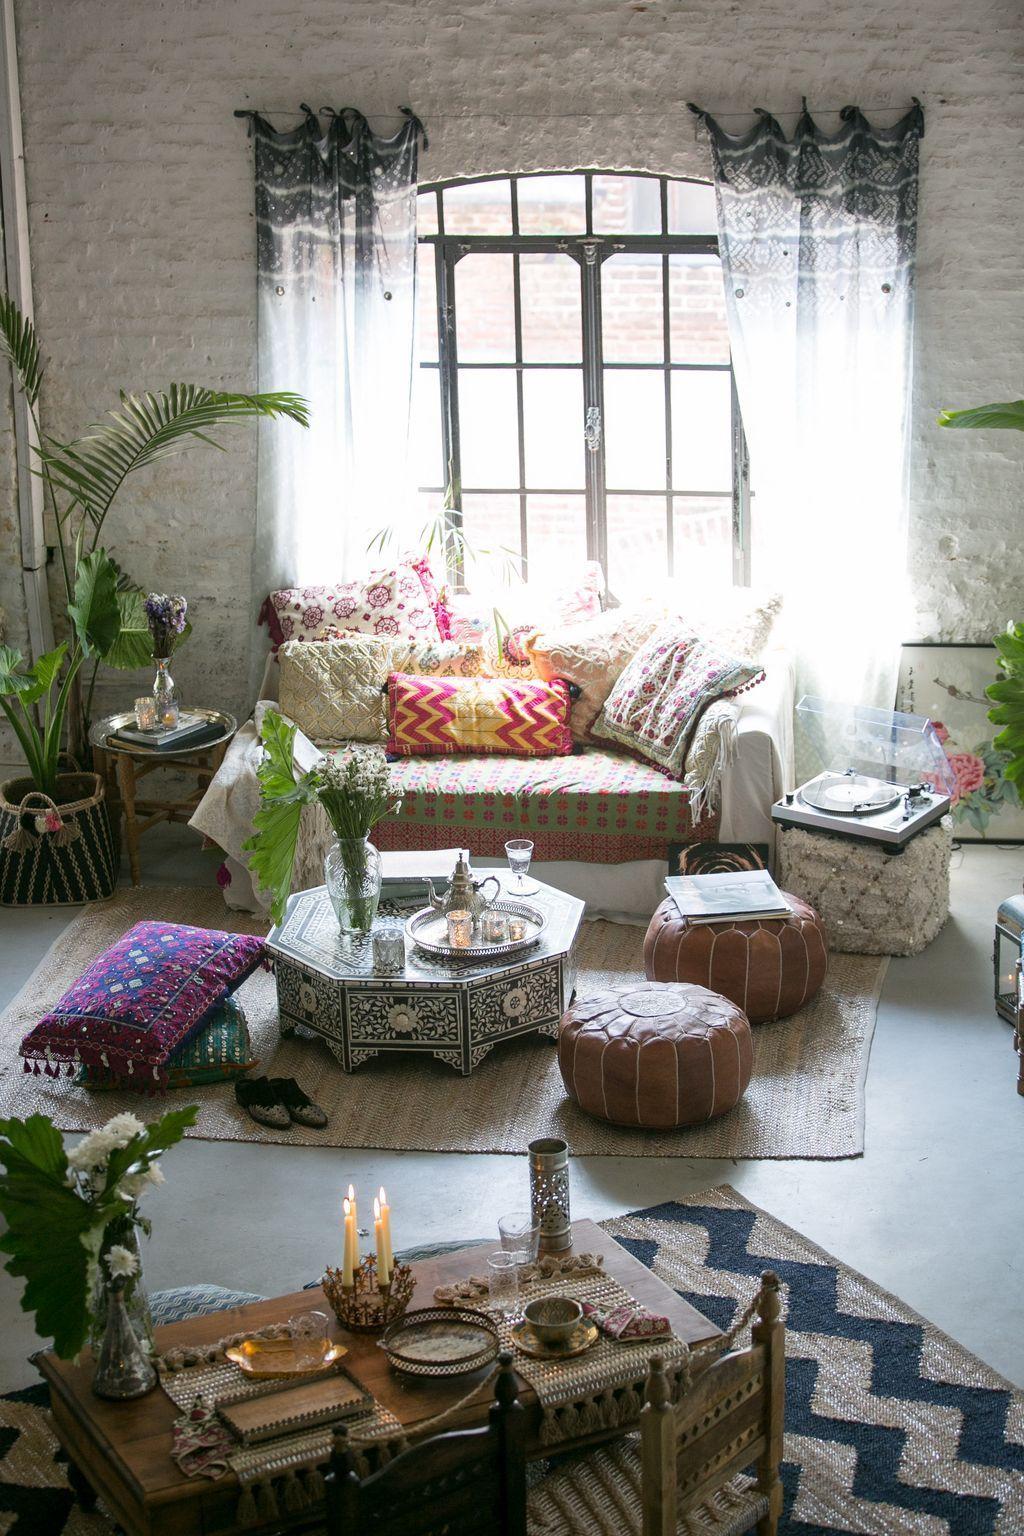 90 modern rustic bohemian living room design ideas decor 2 home decor diy home decor. Black Bedroom Furniture Sets. Home Design Ideas